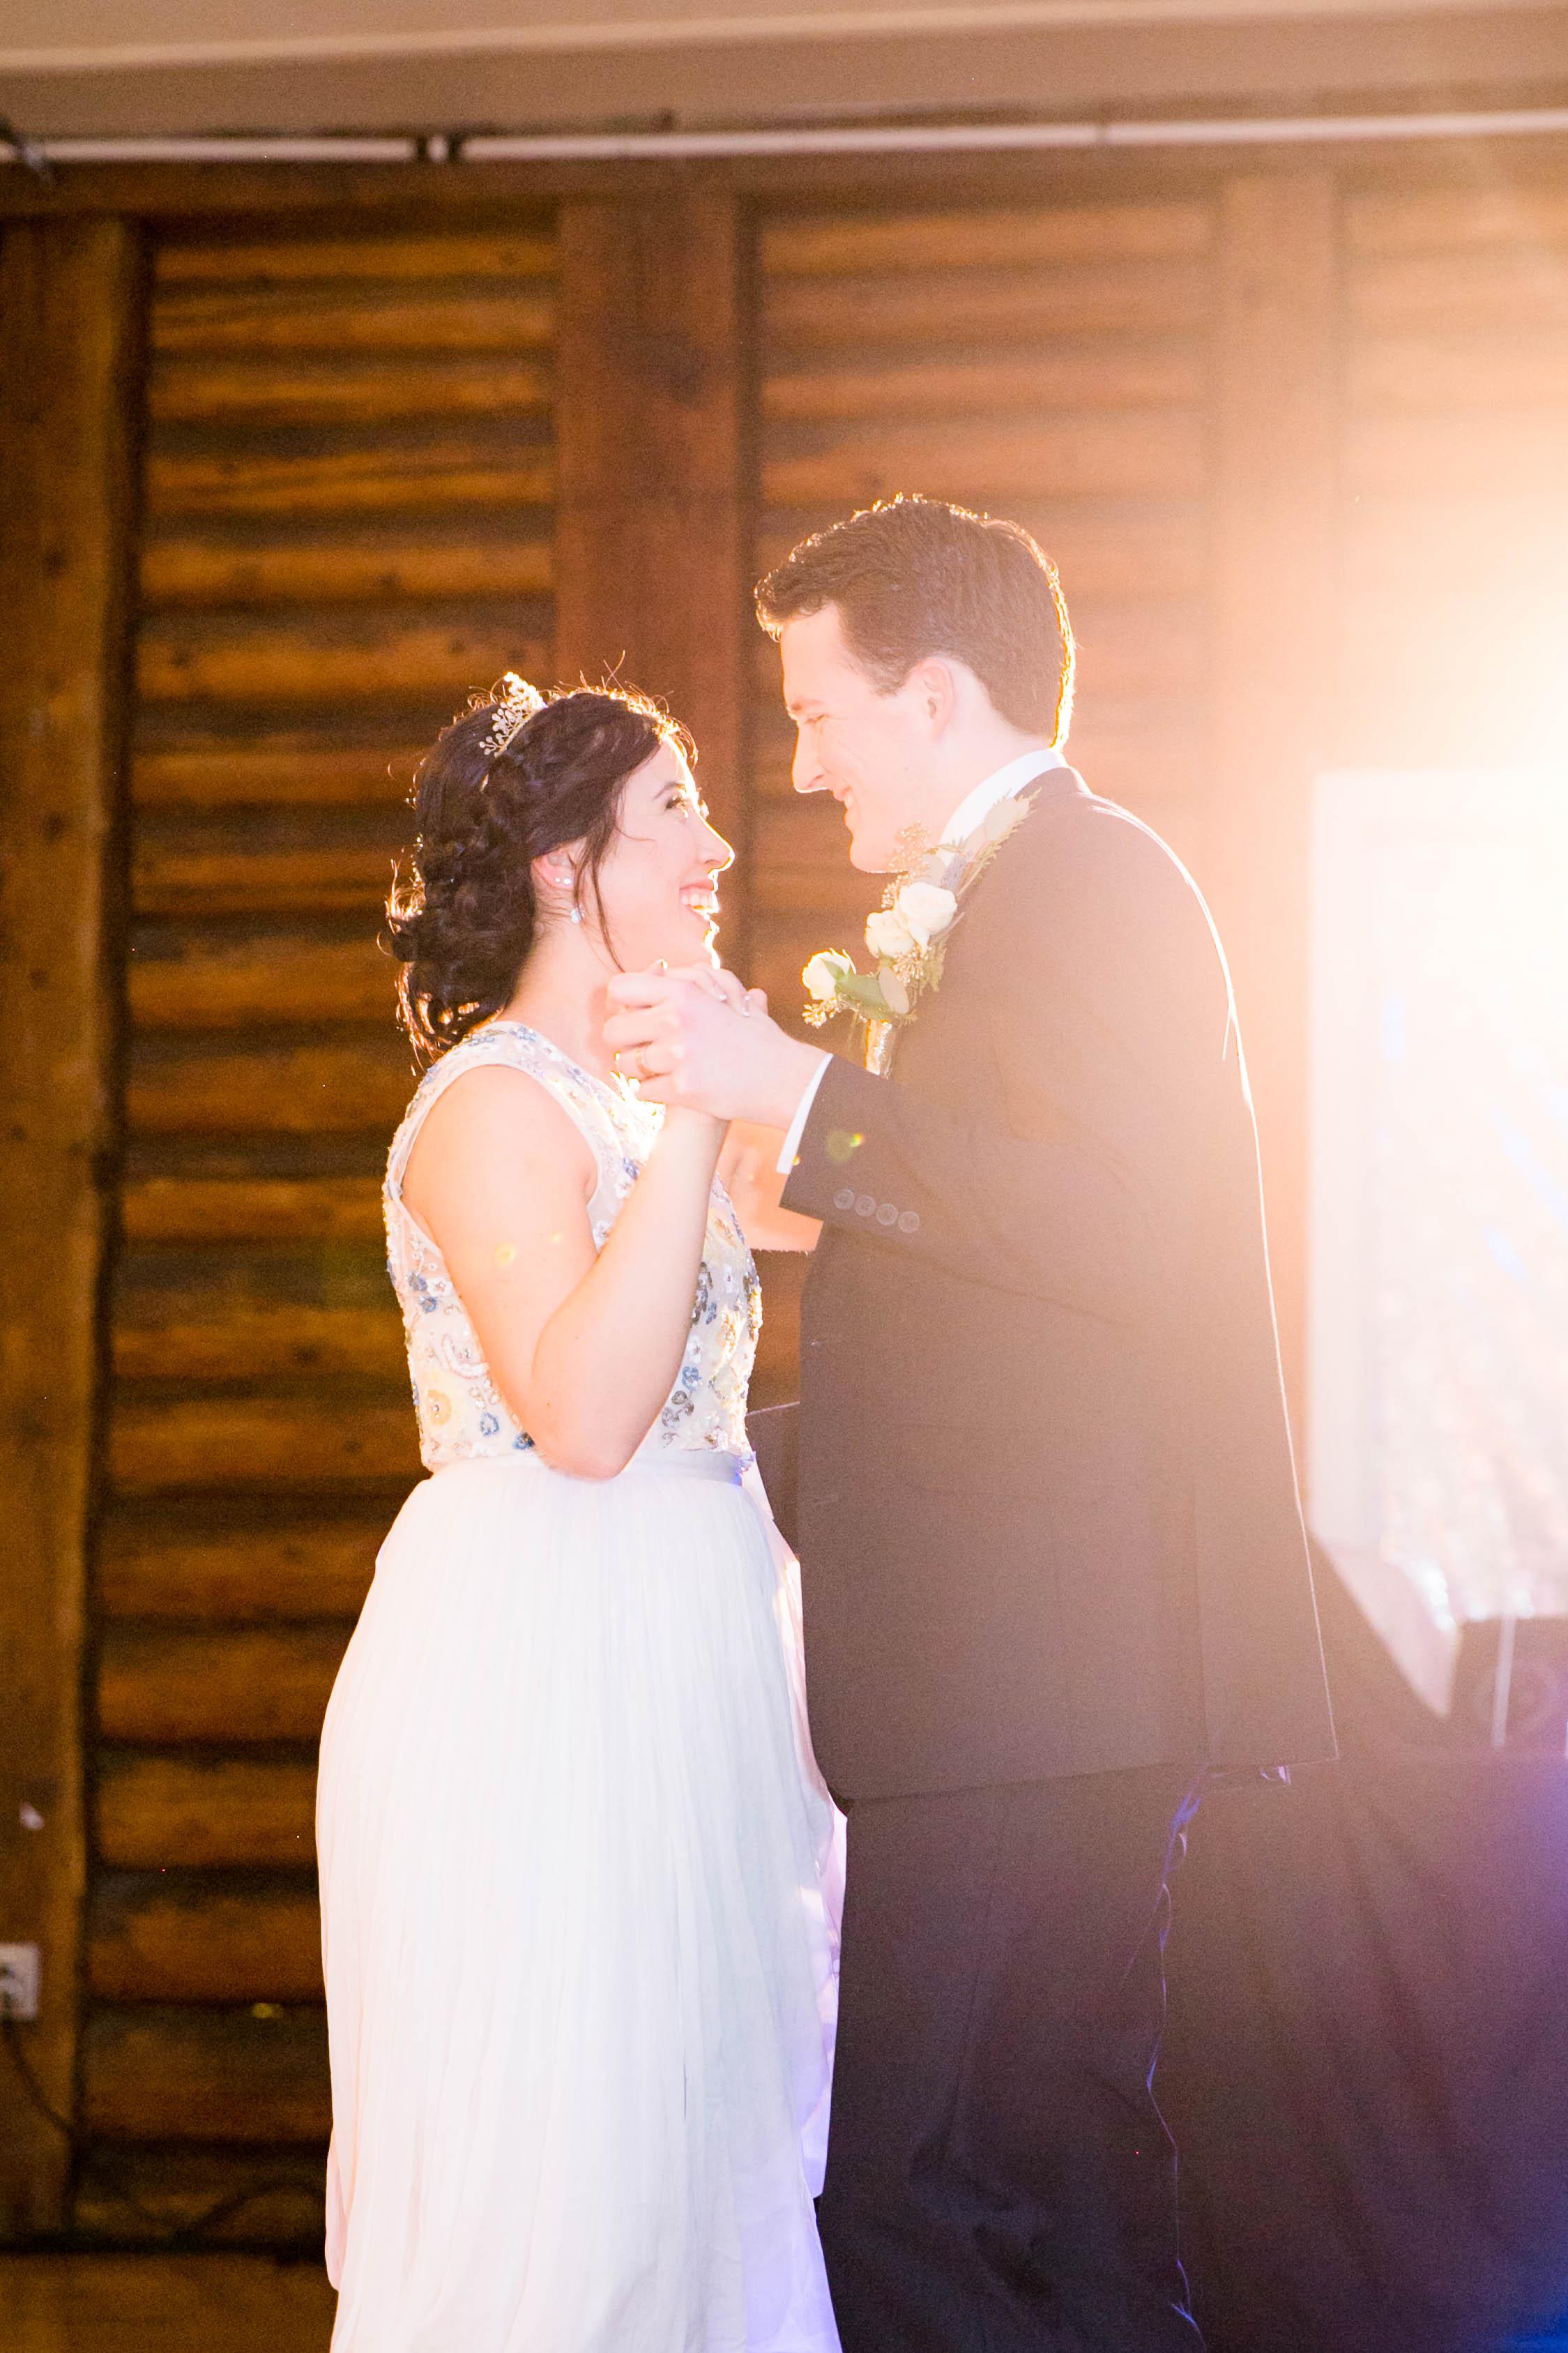 Tri-Cities, TN wedding photography, first dance